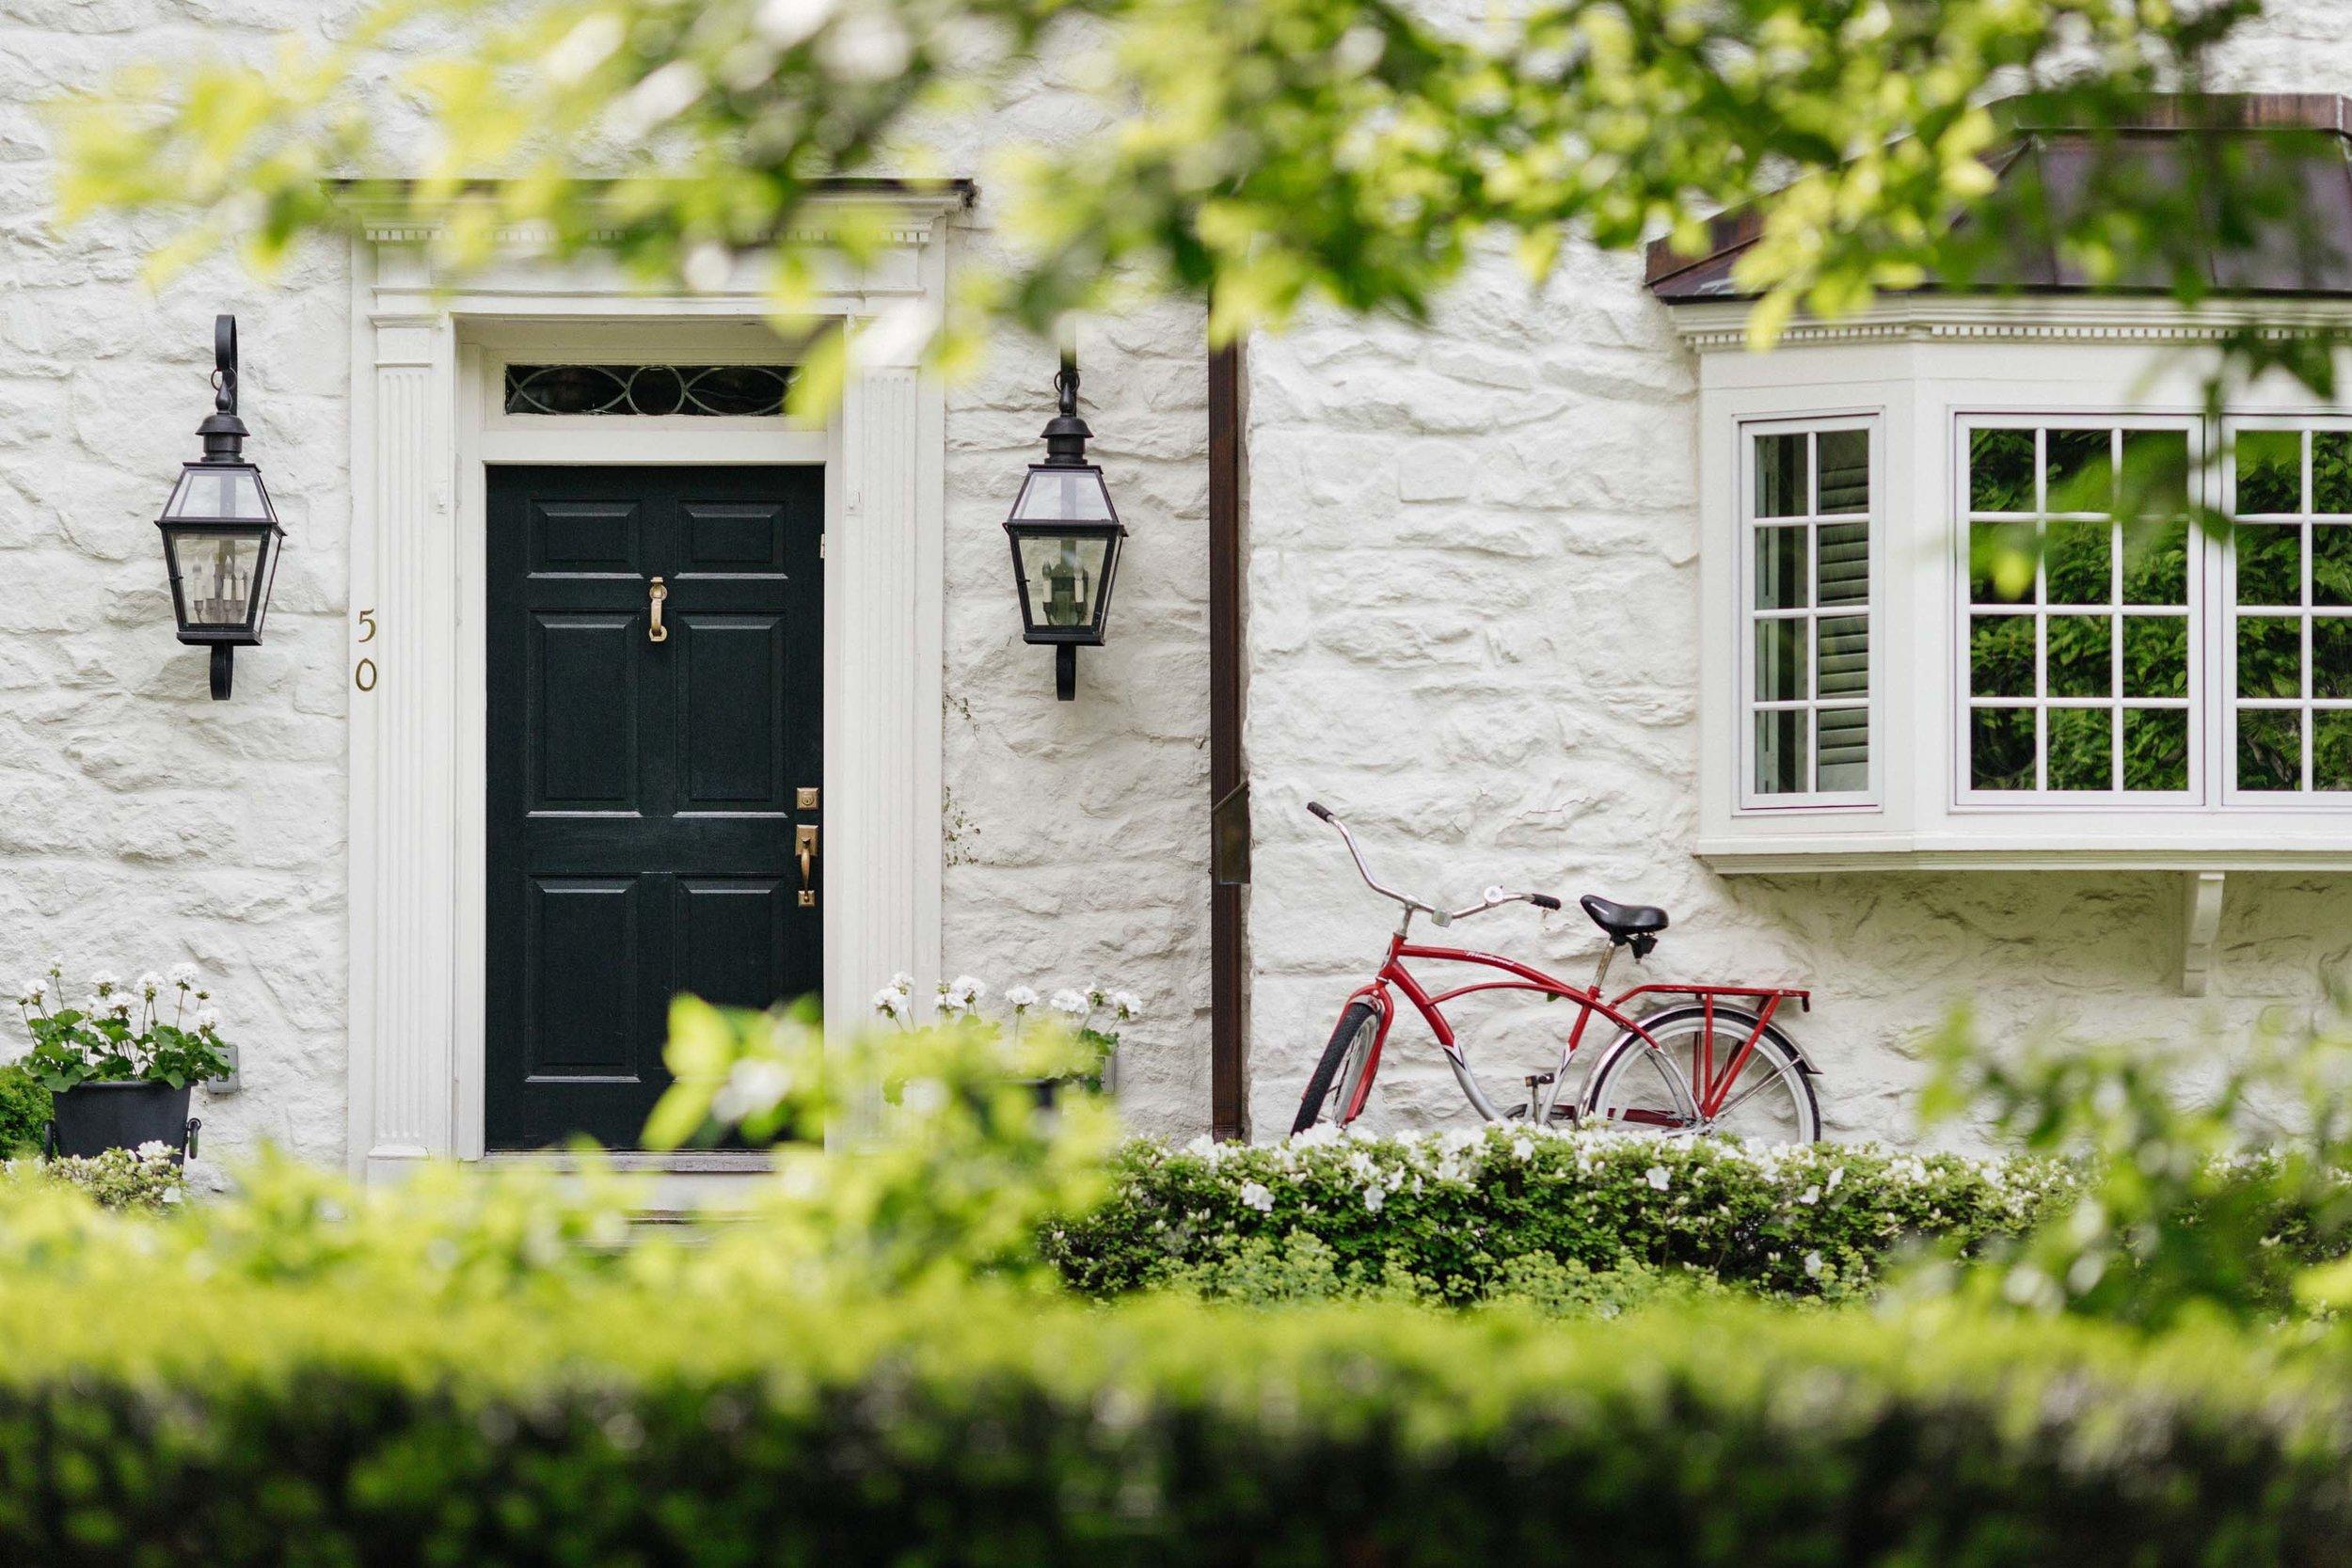 House exterior with front door